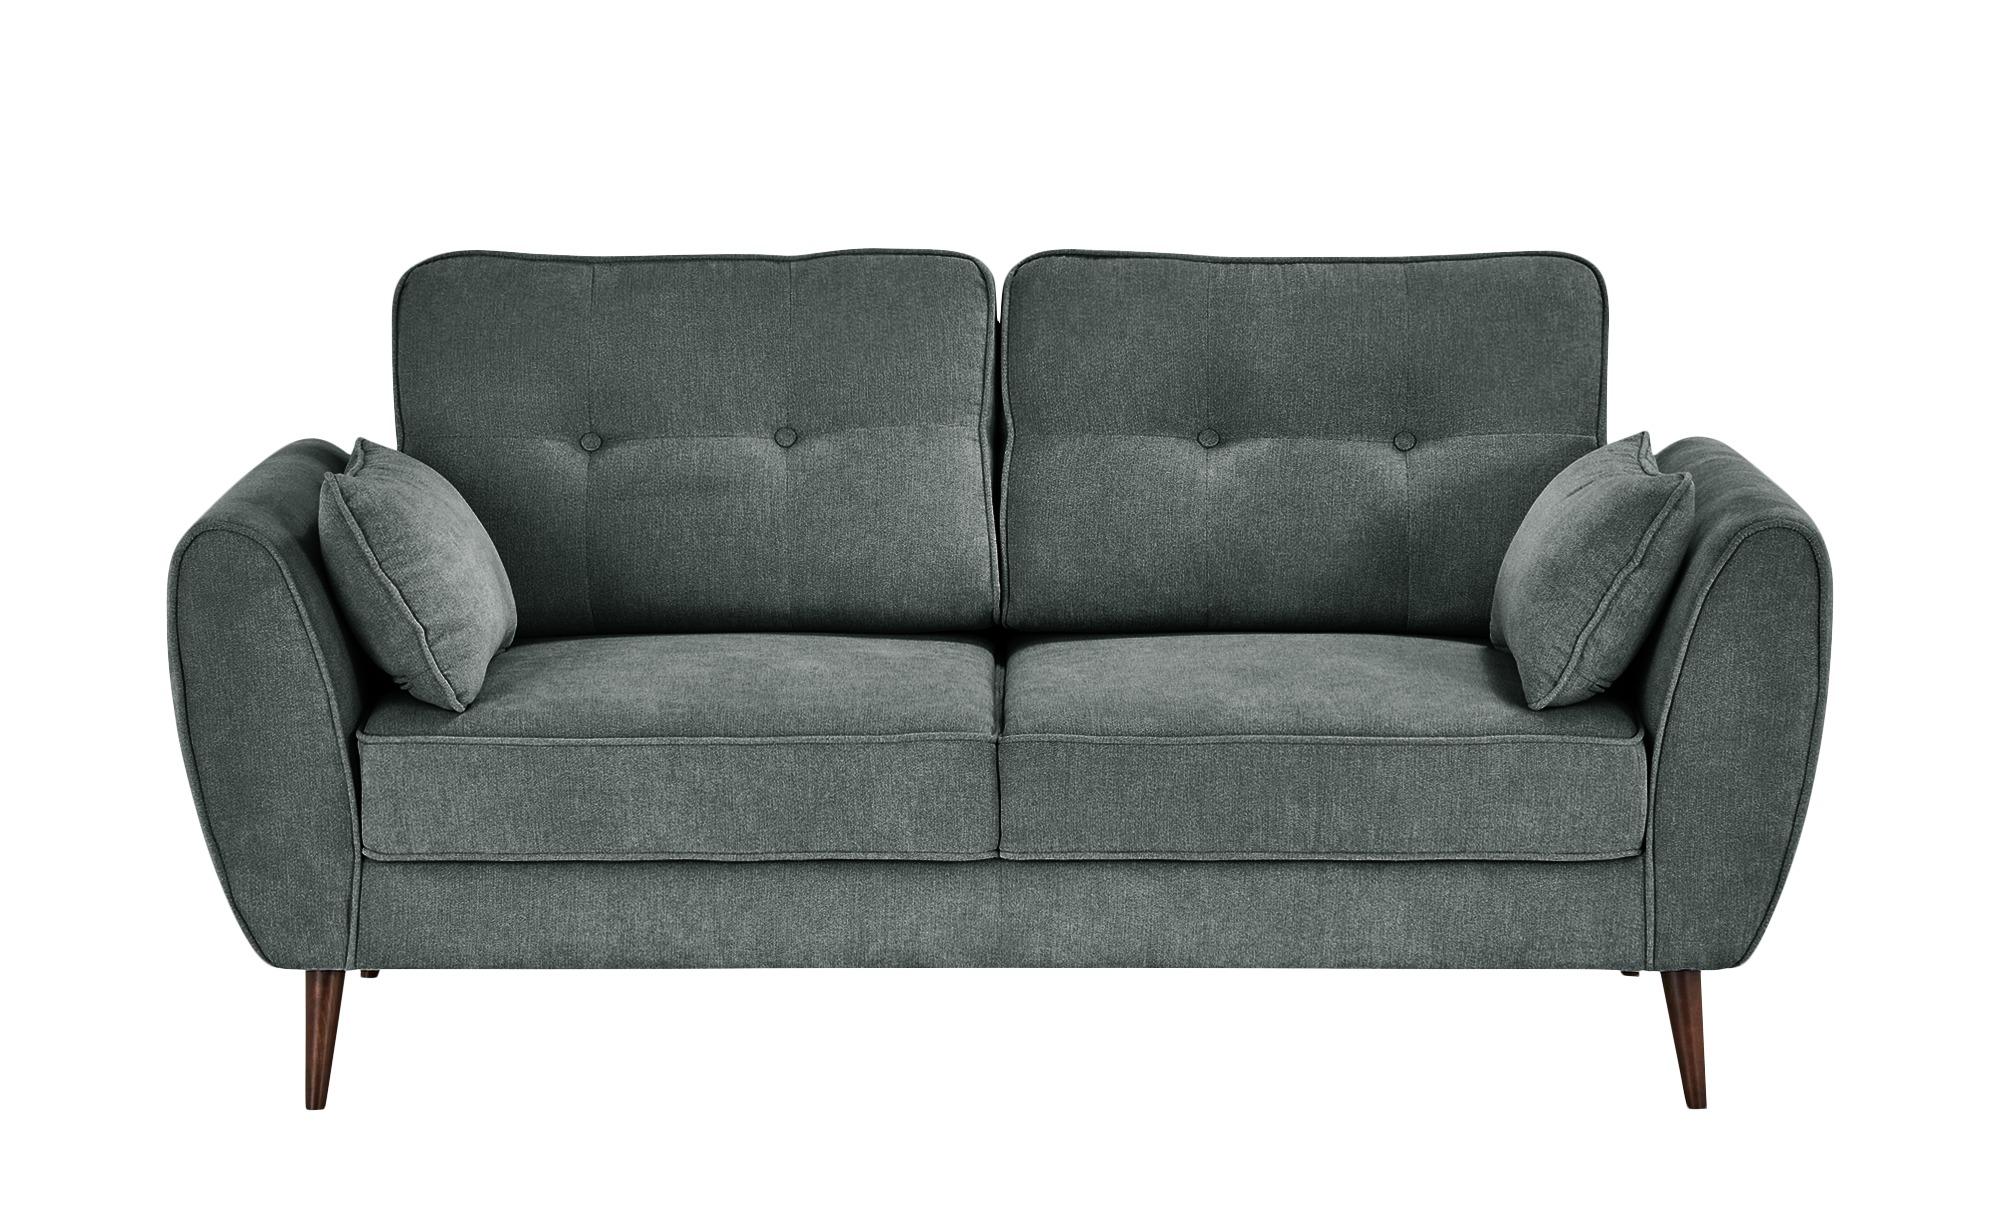 switch Sofa  Candy ¦ grau ¦ Maße (cm): B: 184 H: 86 T: 94 Polstermöbel > Sofas > 2-Sitzer - Höffner